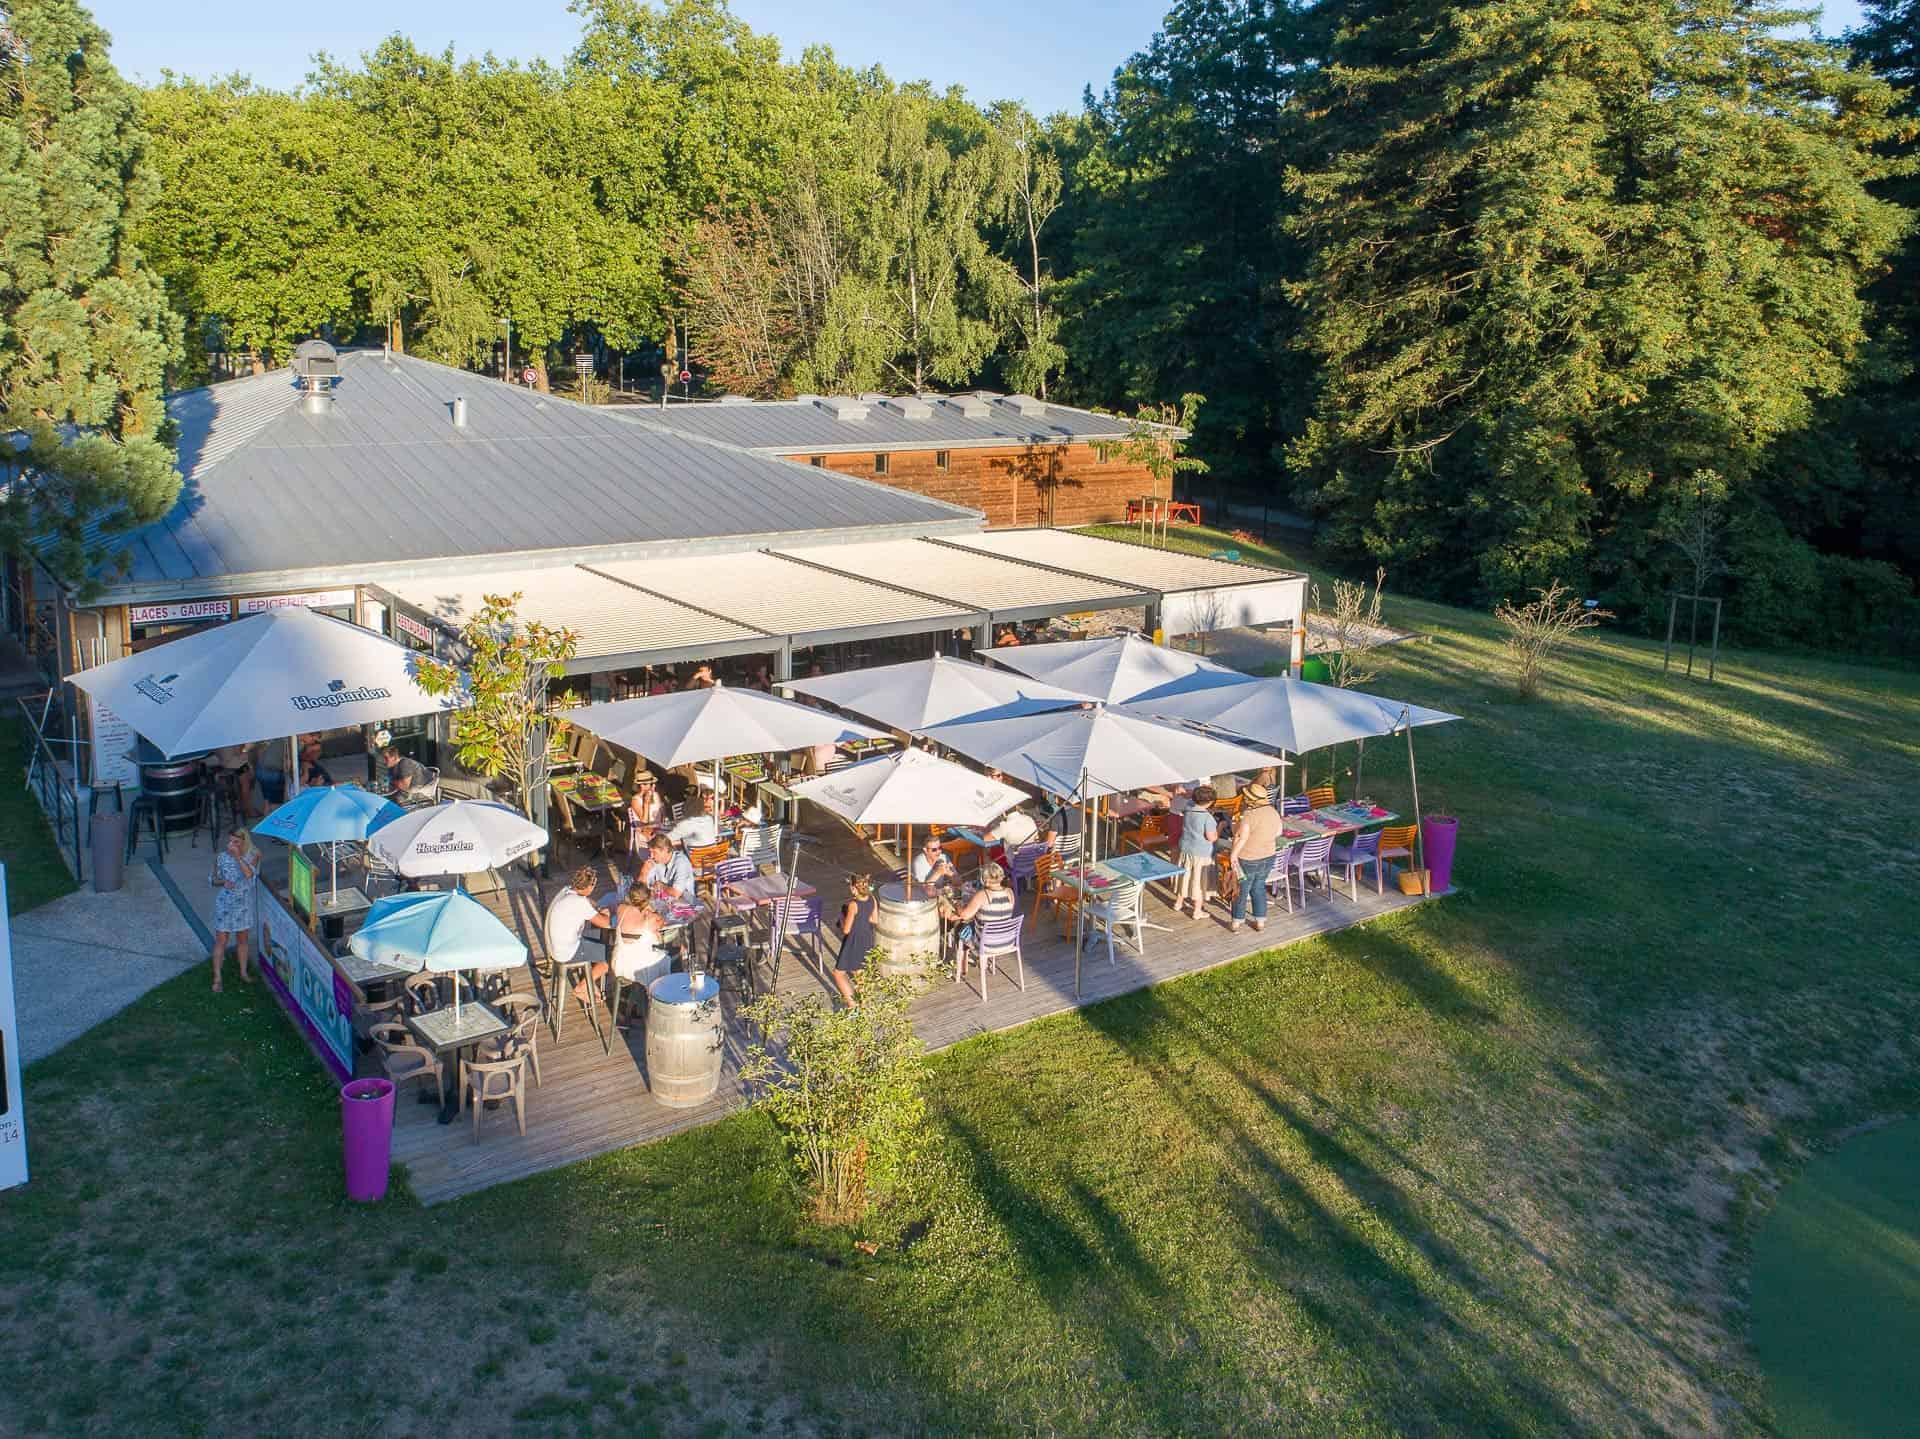 camping du petit port camping party nantes 2019